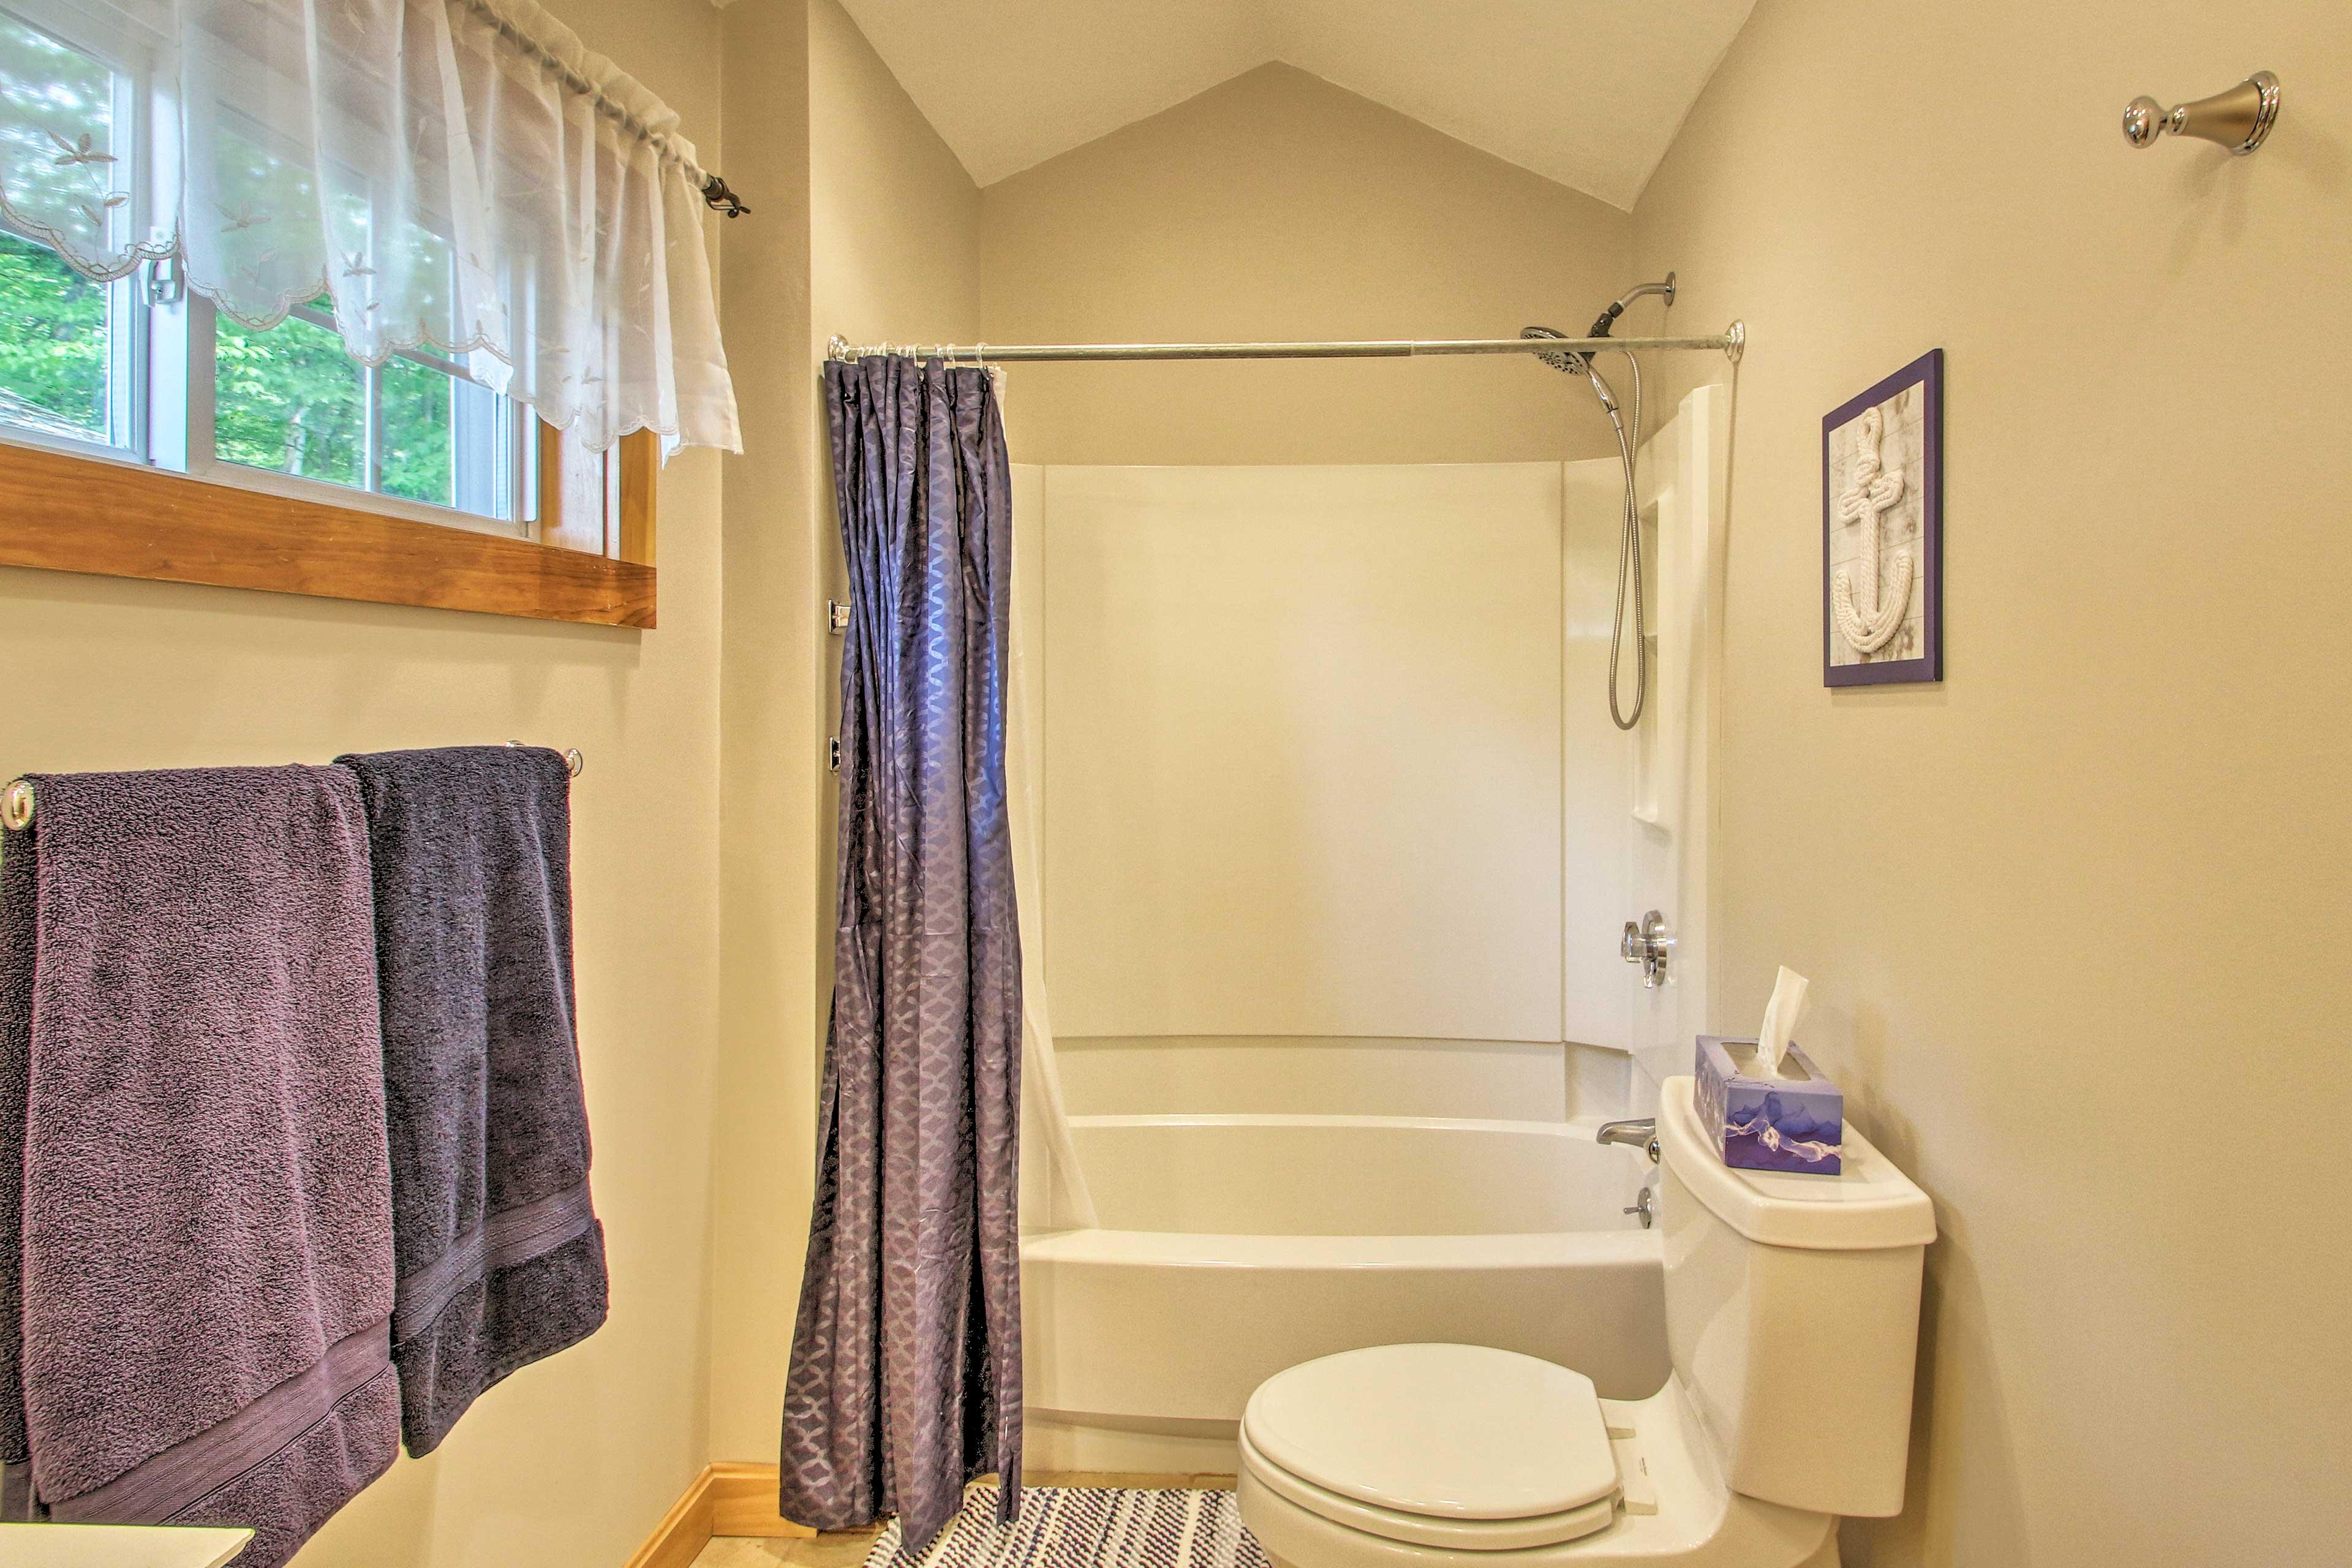 This home has 2 pristine bathrooms.